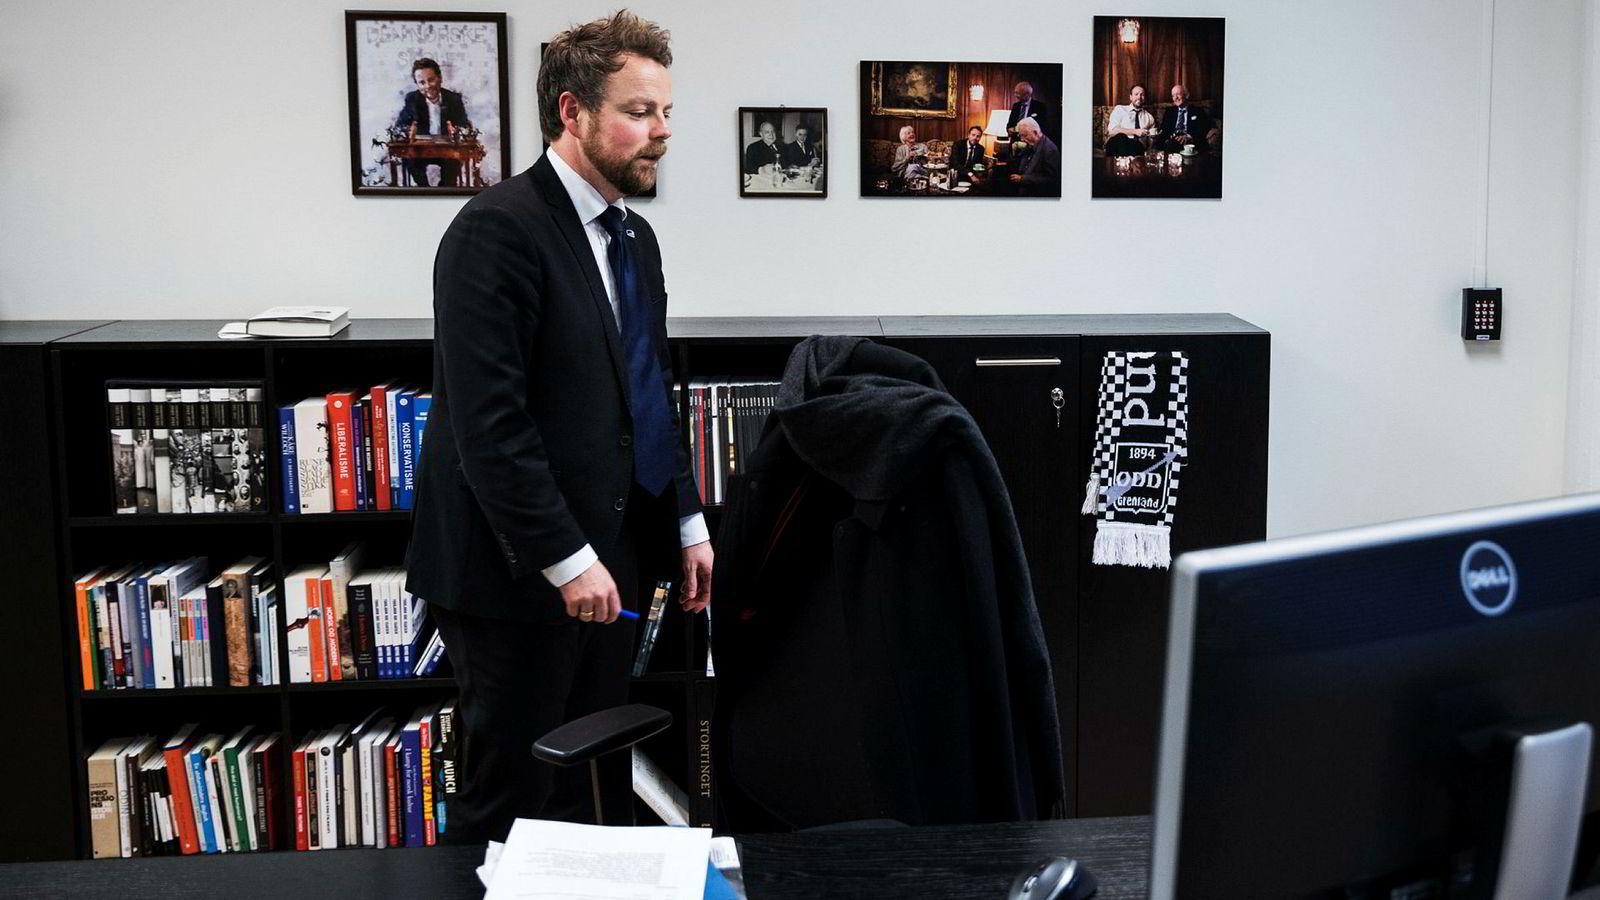 Næringsminister Torbjørn Røe Isaksen er bekymret over at for få norske teknologiselskaper blir til vekstlokomotiver.